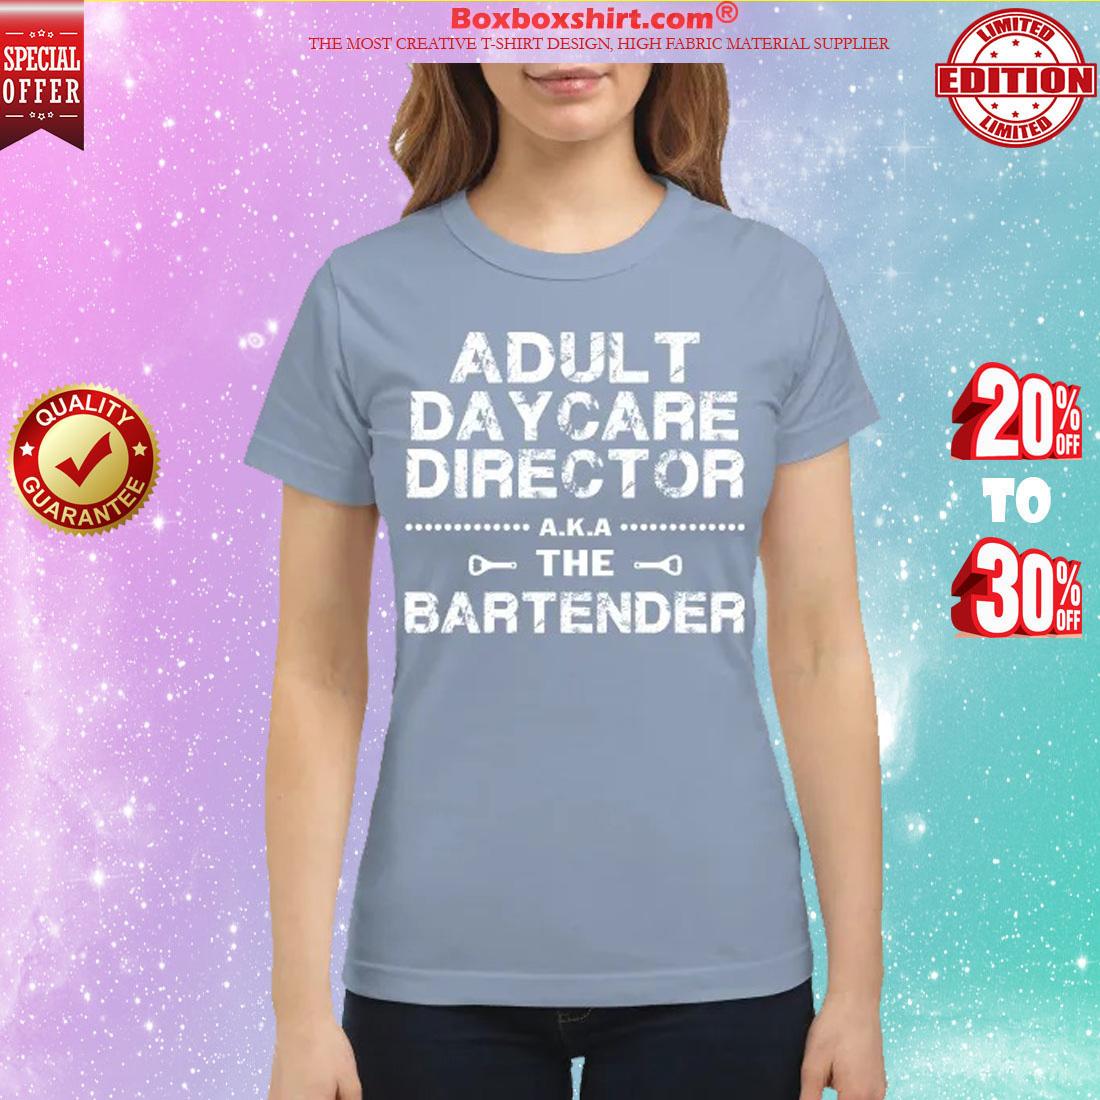 Adult daycare director the bartender shirt